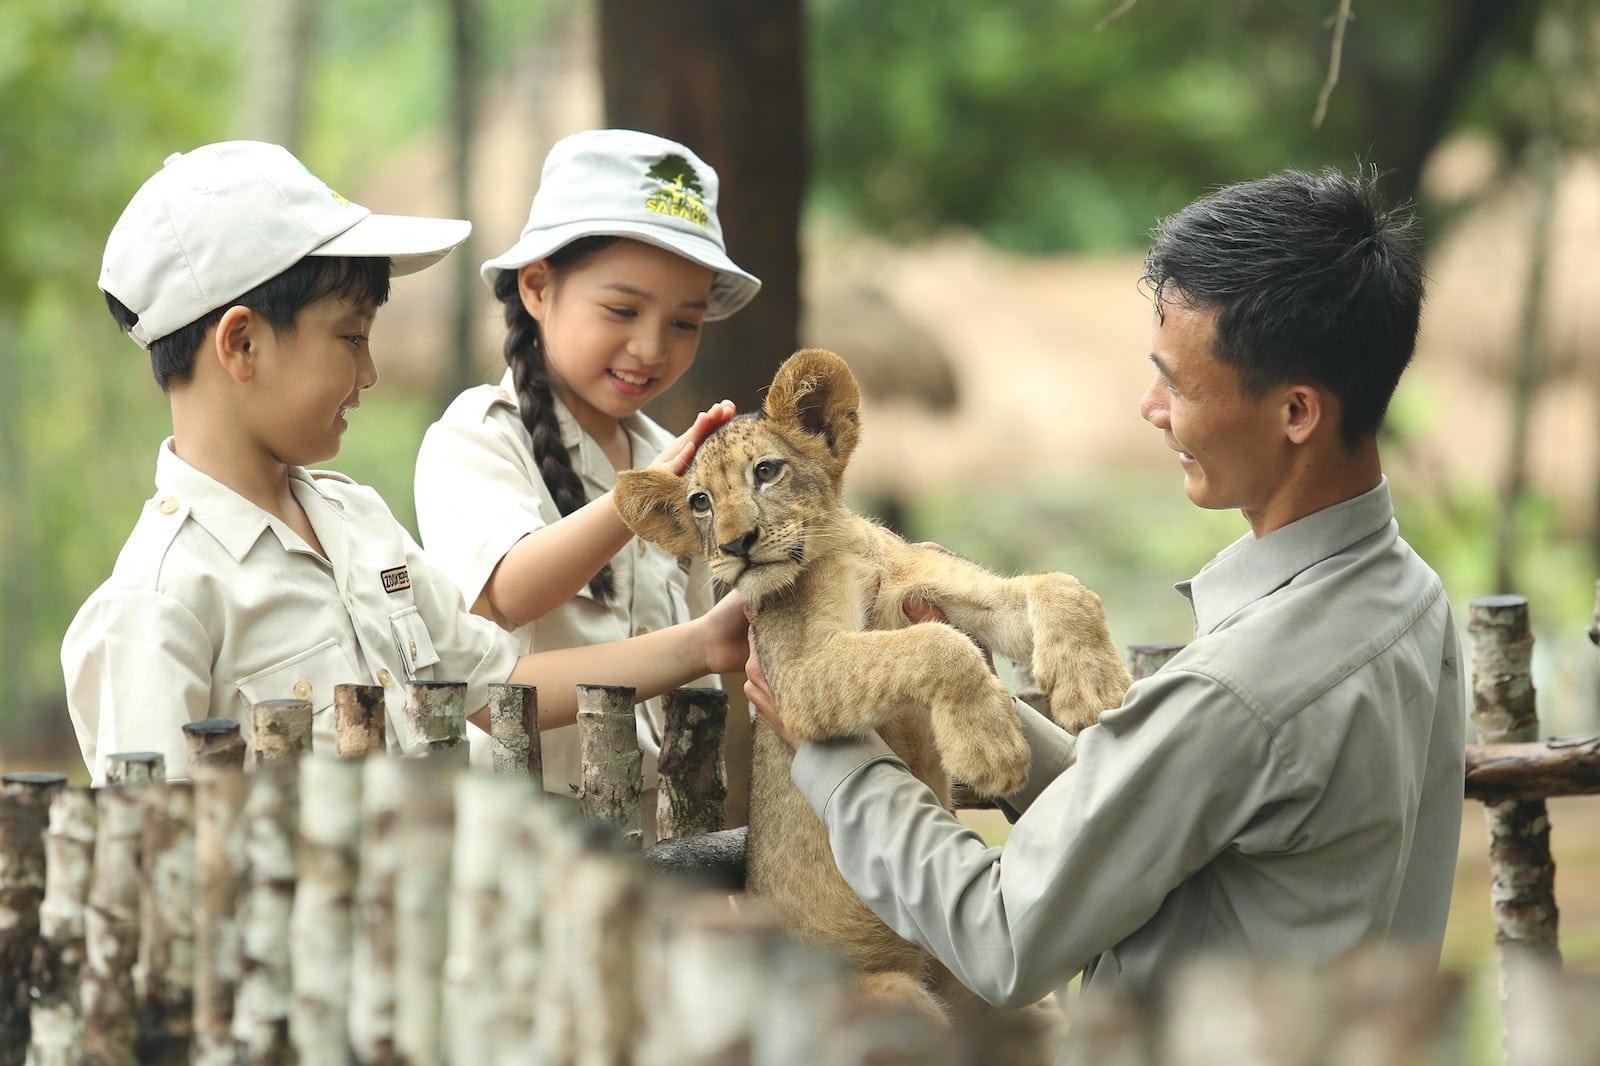 Image of children petting a lion cub at Vinpearl Safari Phu Quoc in Vietnam